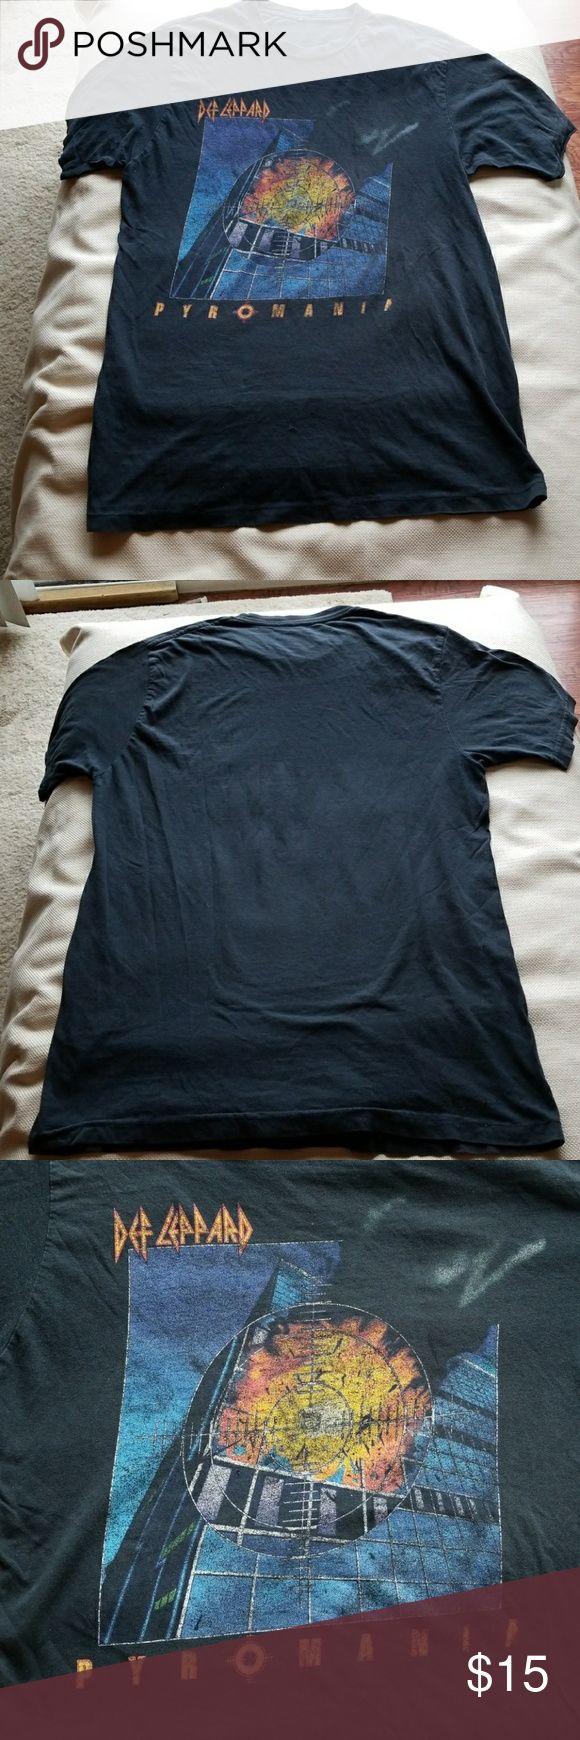 Def Leppard vintage t shirt T shirt Shirts